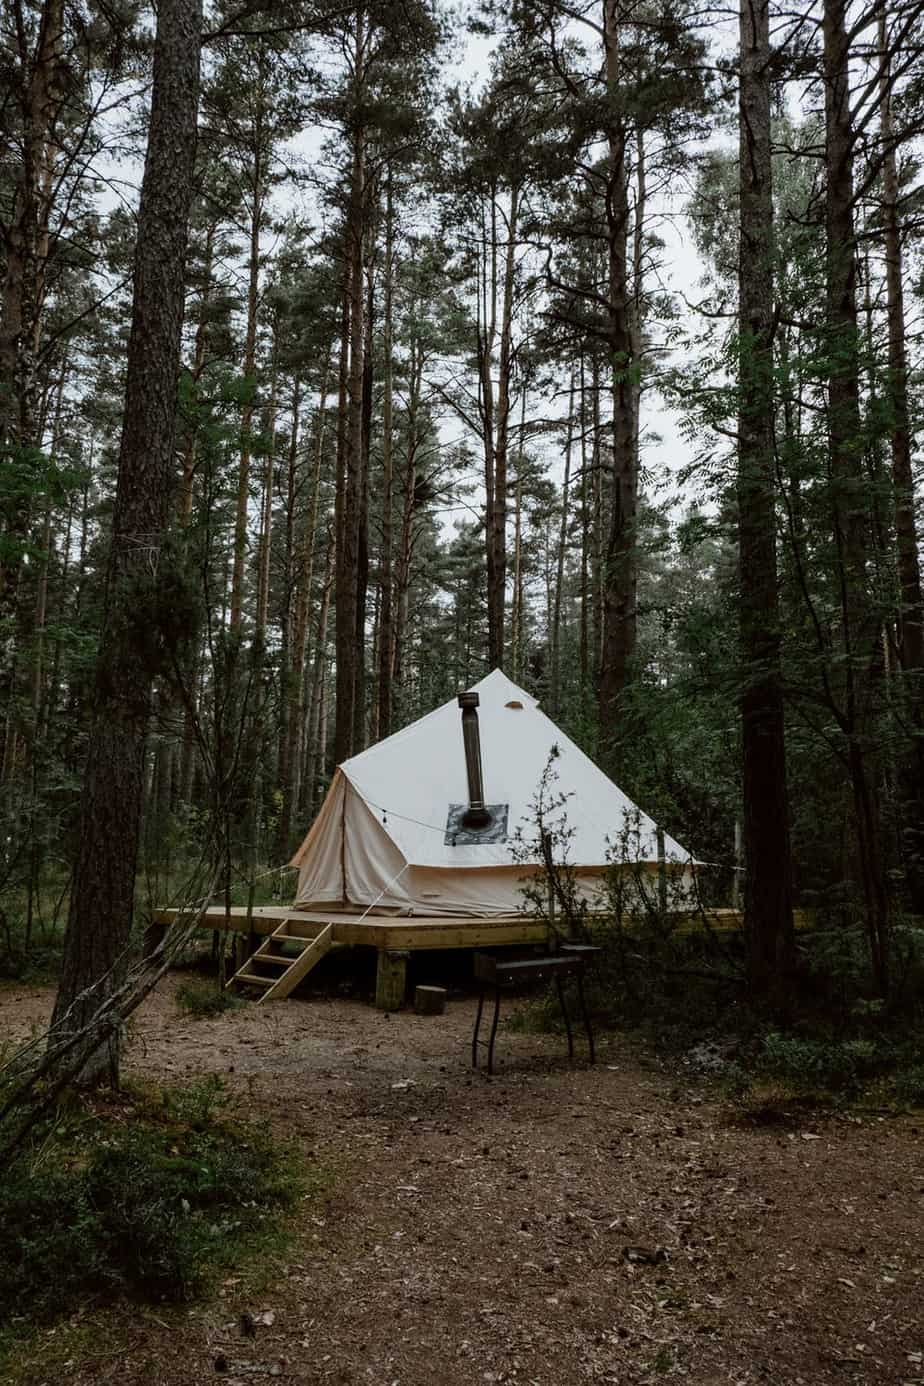 kamperen in Nederland